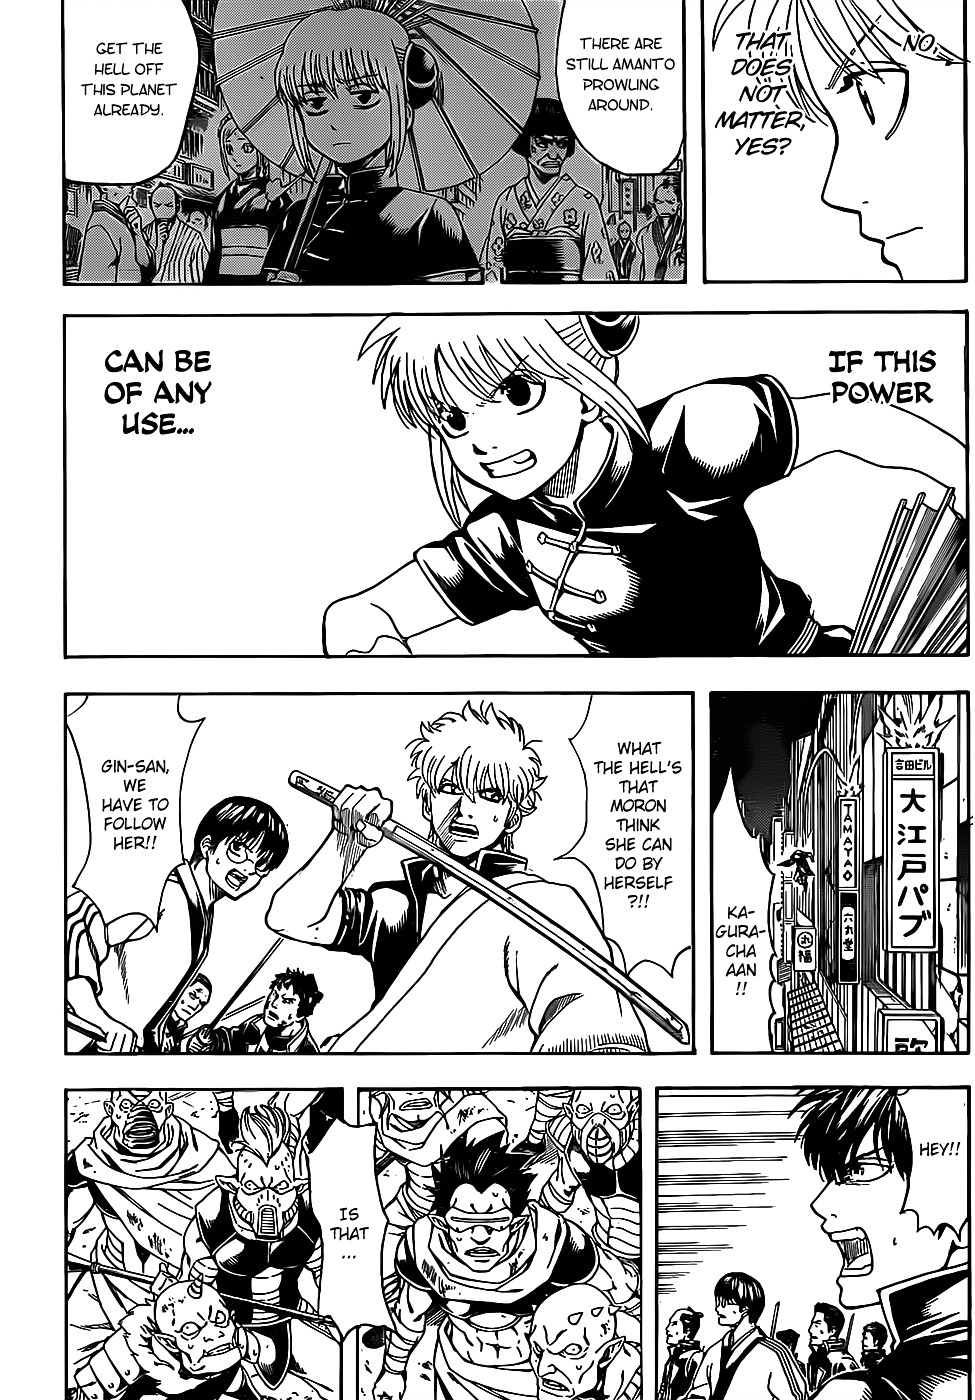 Gintama Chapter 634.2  Online Free Manga Read Image 6